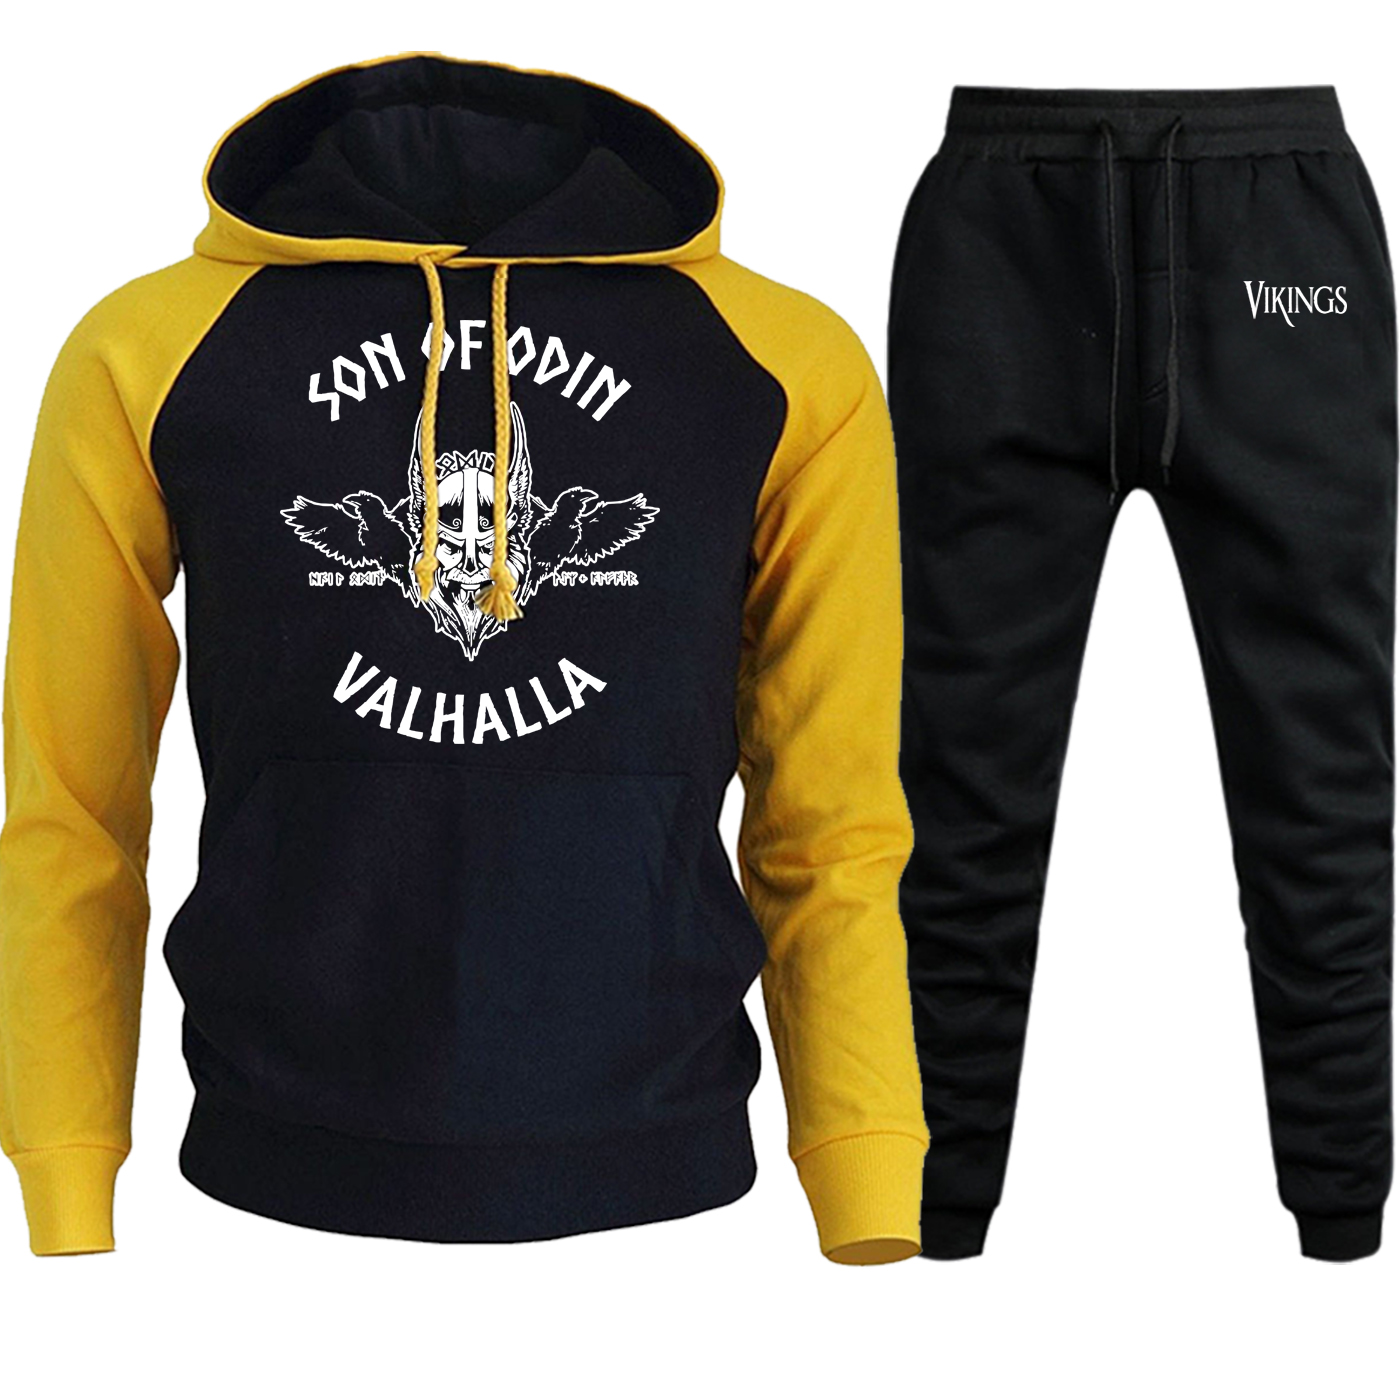 Son Of Odin Valhalla Sweatshirt Men Raglan Vikings Hoodies 2019 Autumn Winter Suit Fleece Pullover Funny Hoody+Pants 2 Piece Set